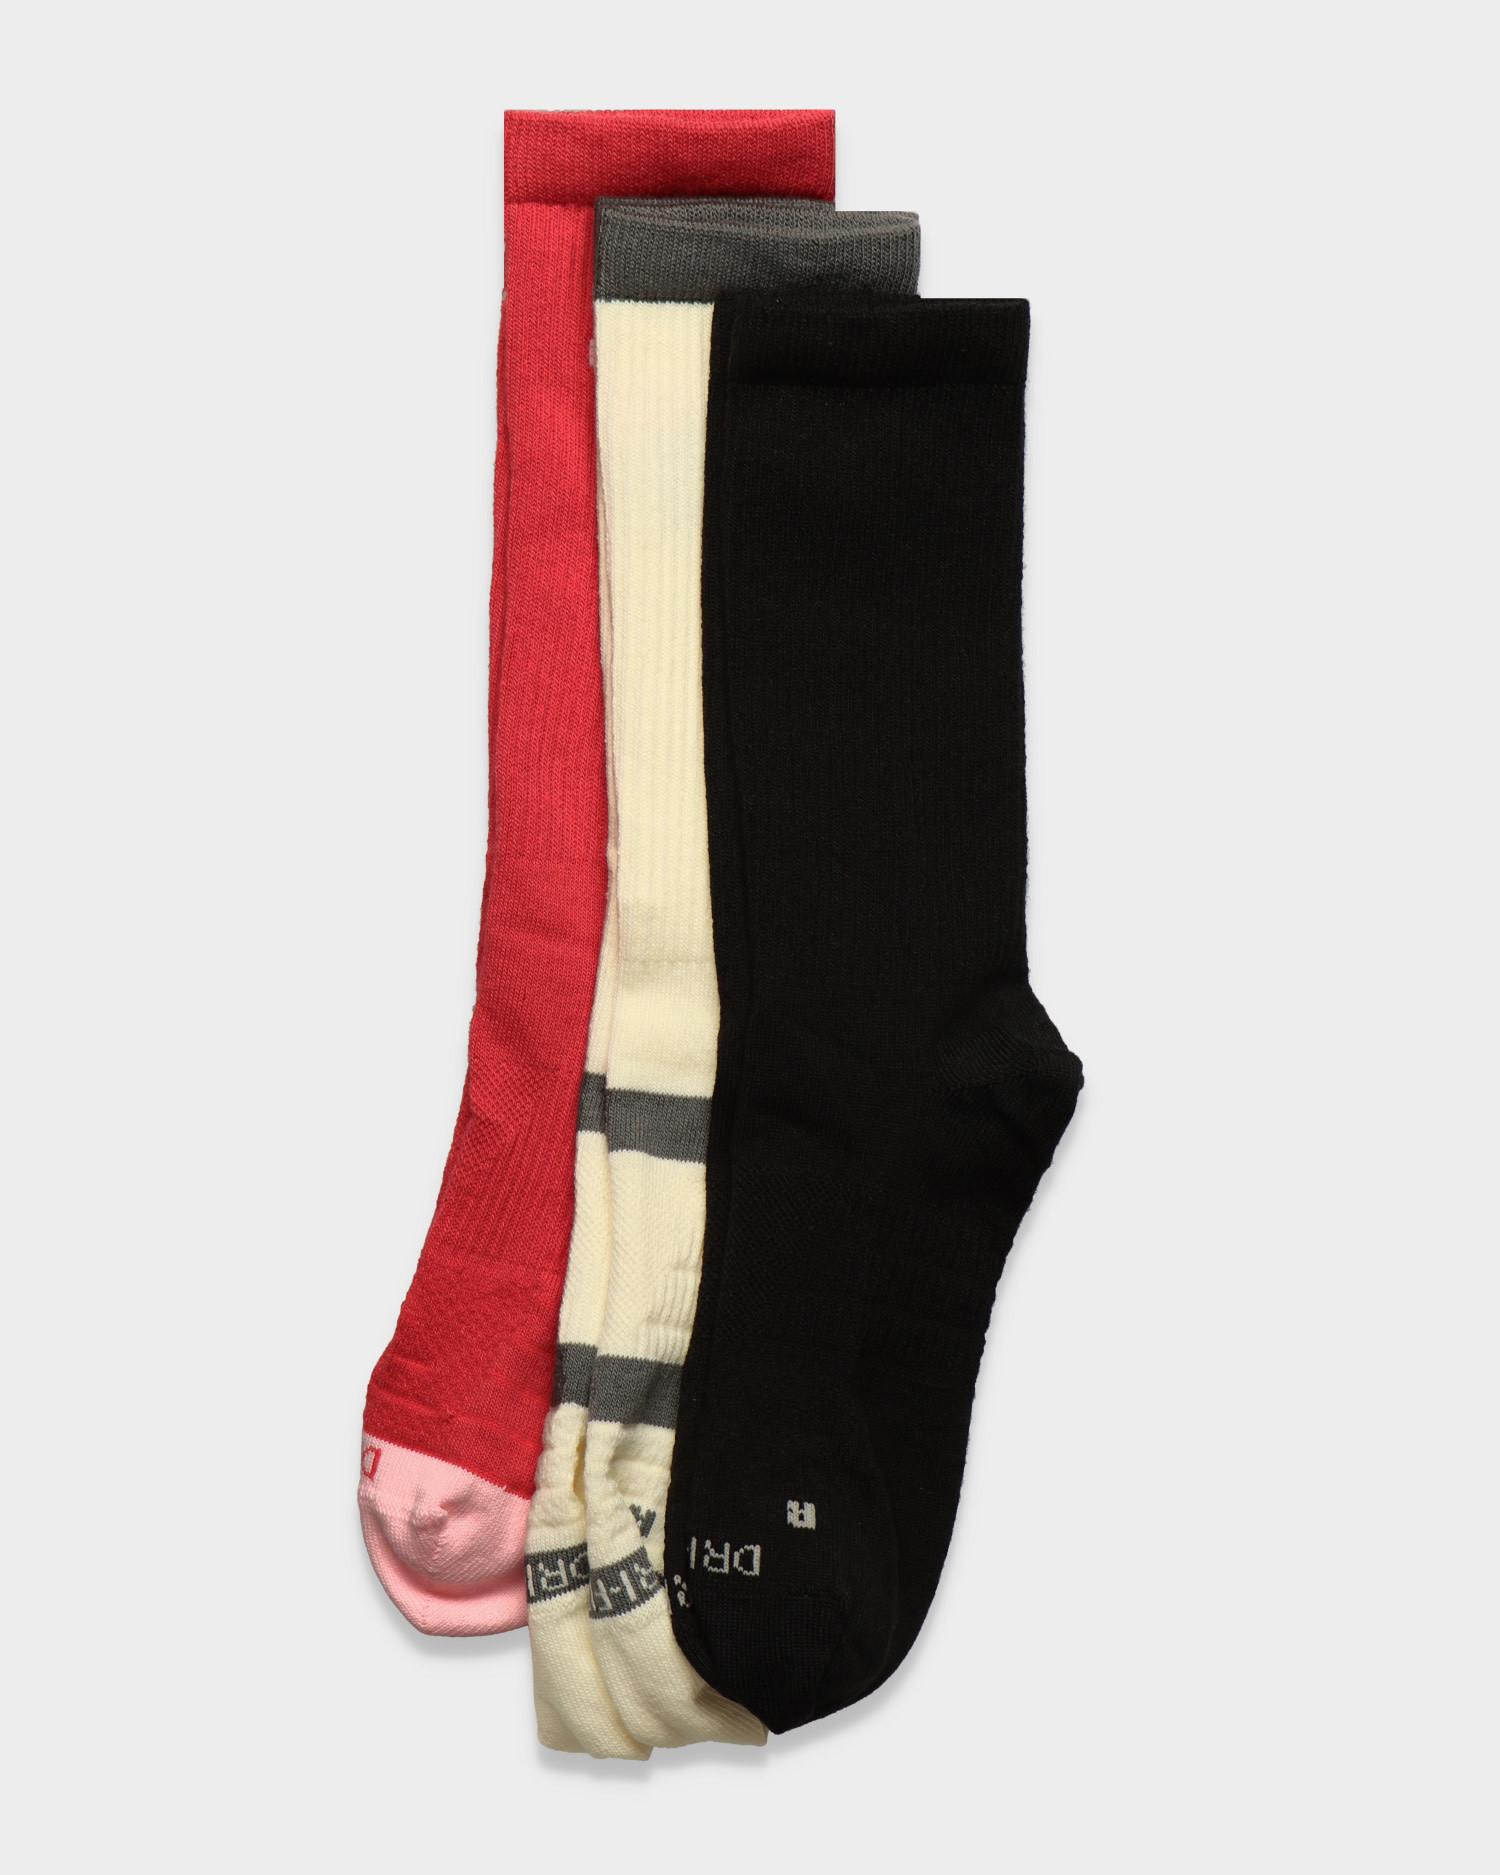 Nike Sb 3-Pack Socks Everyday Max Ltwt Crew Pink/Black/White